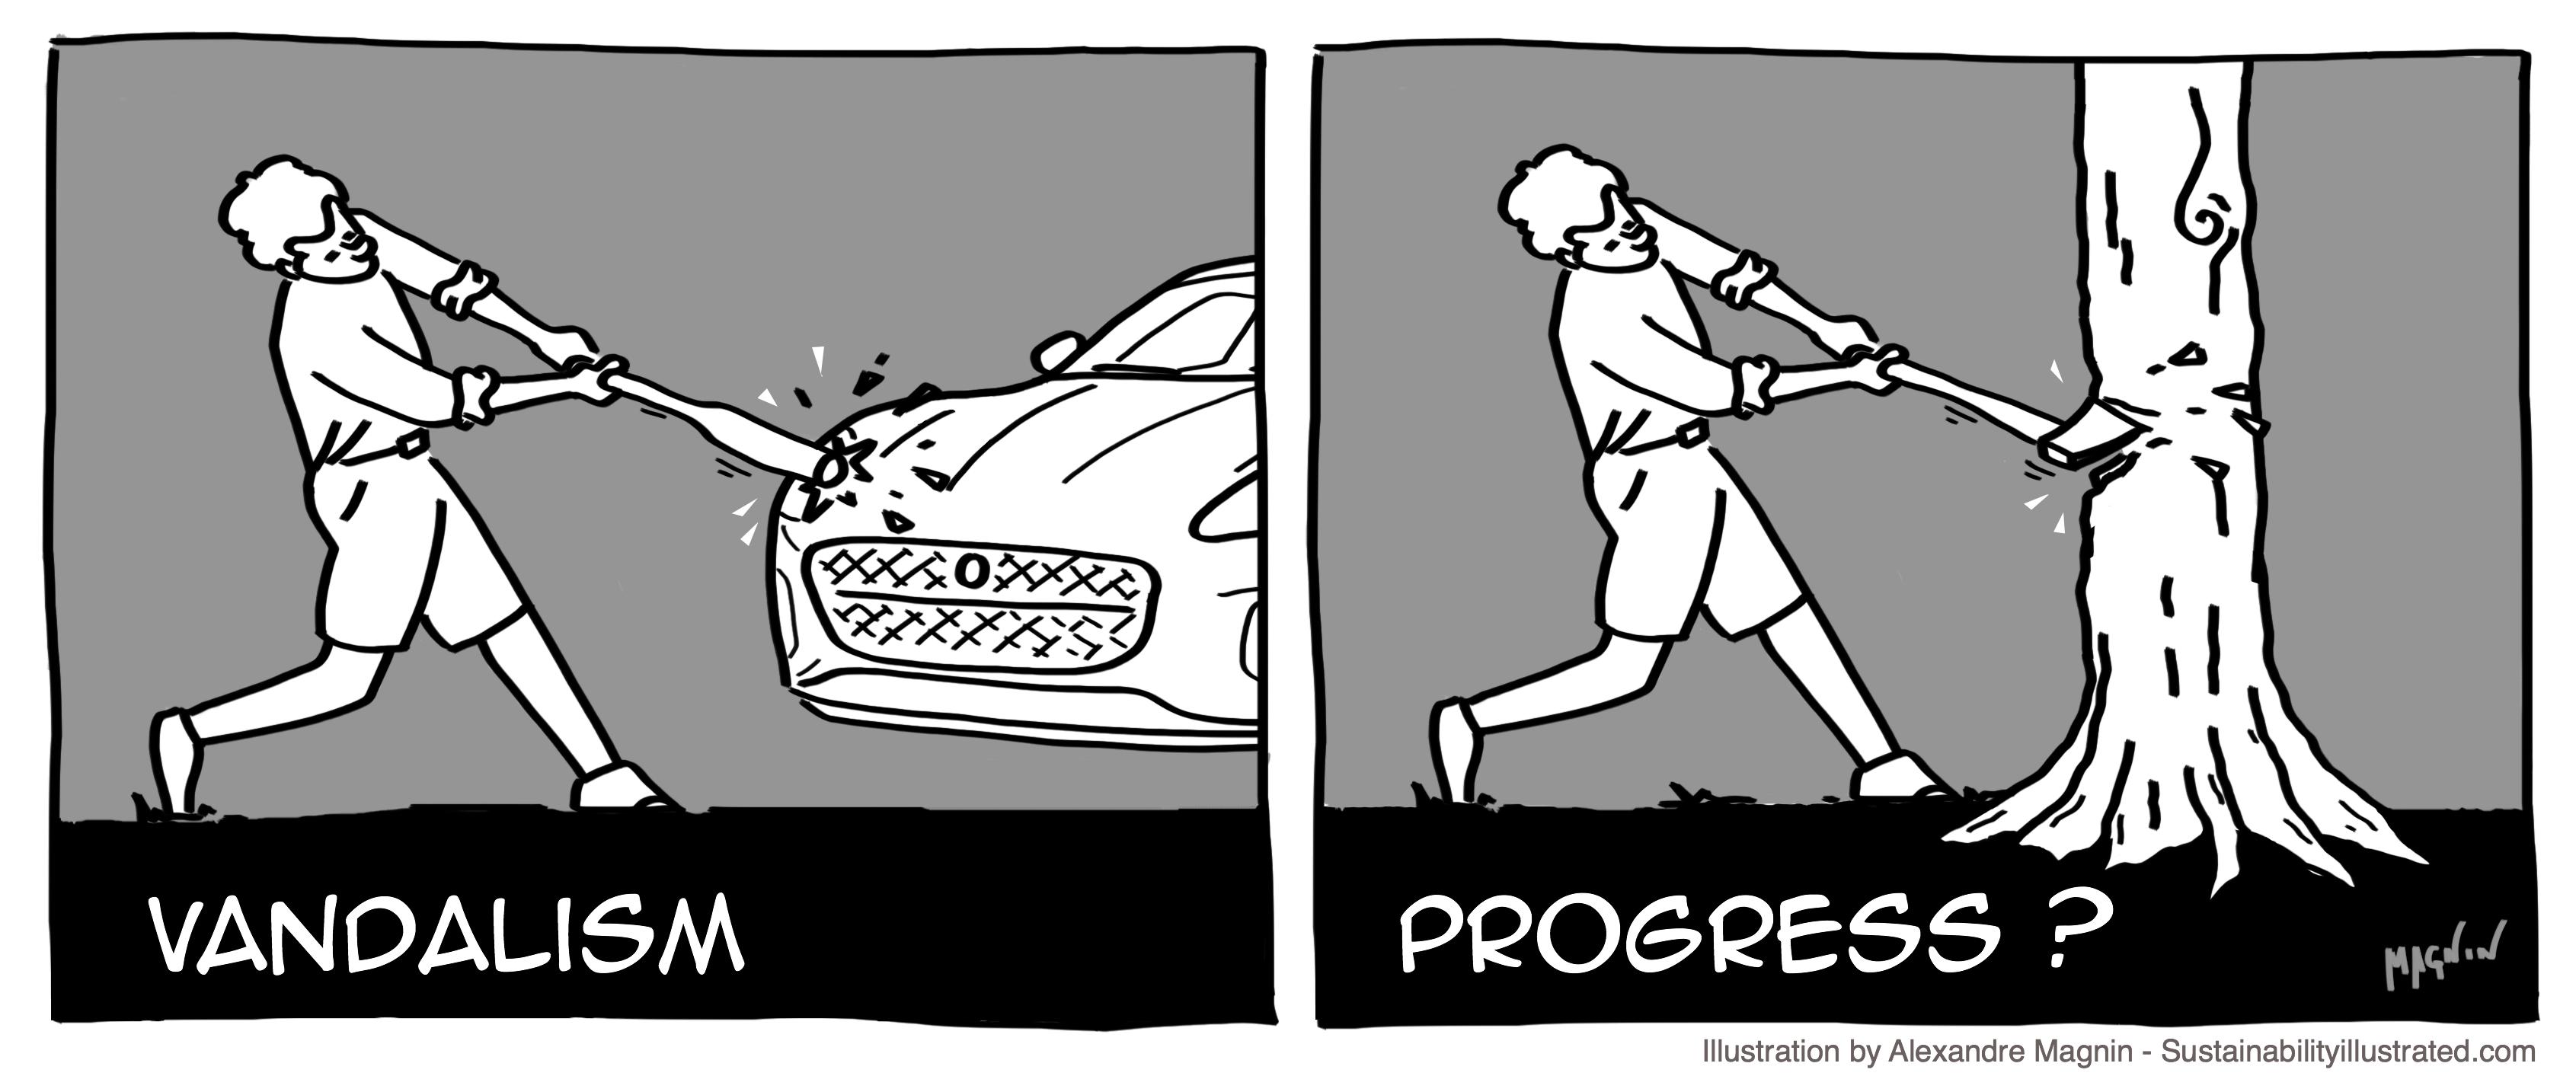 Progress-Vandalism-Cartoon